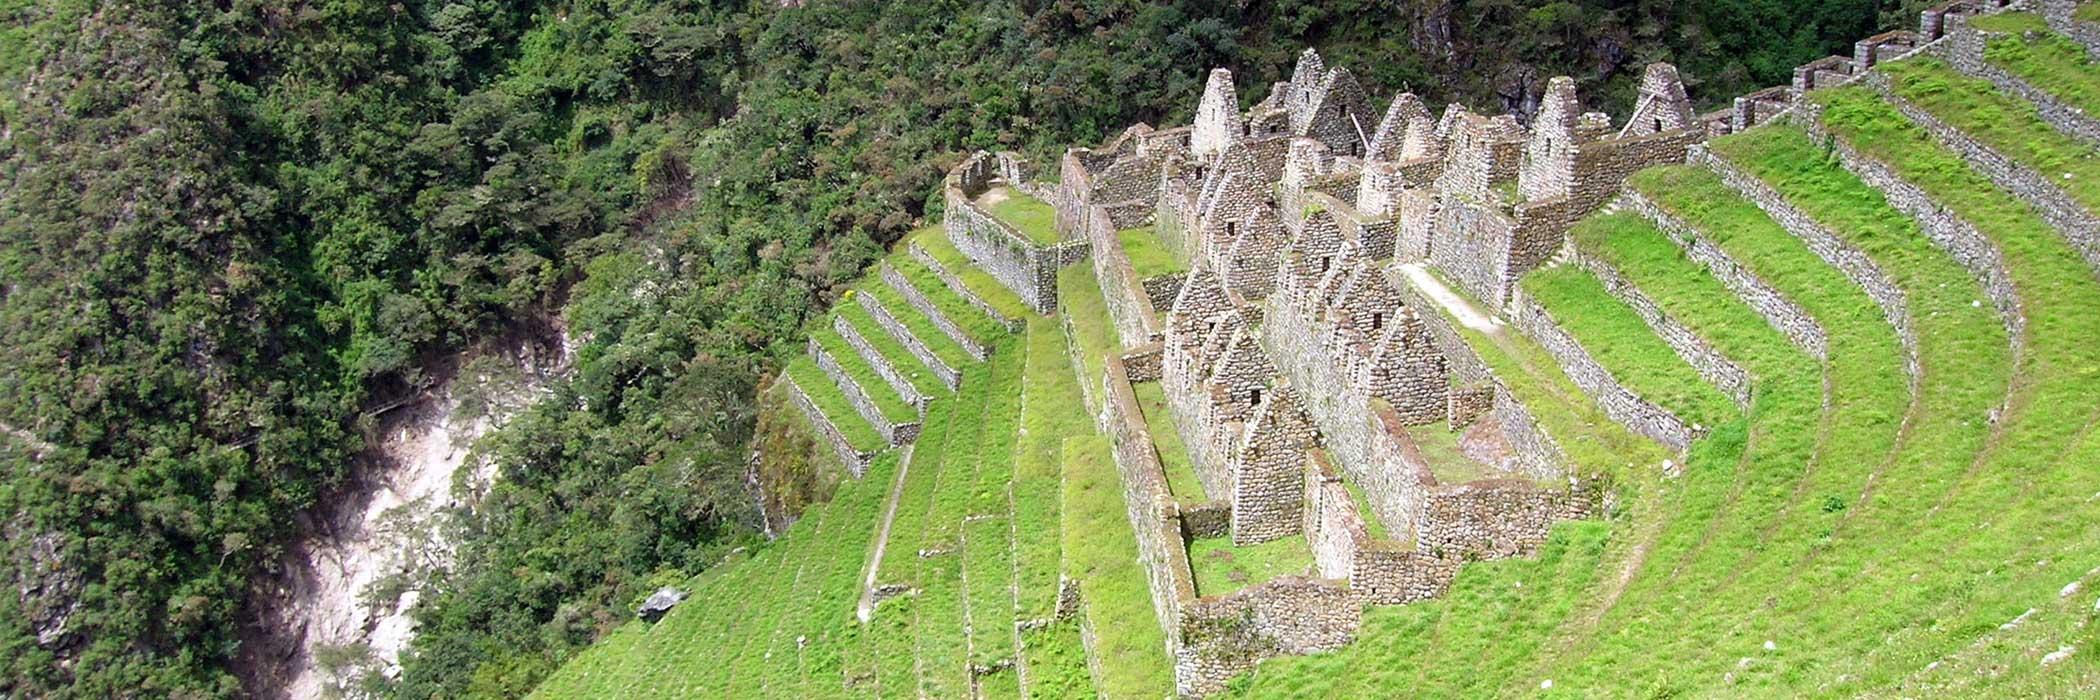 winayhuayna cusco peru tour